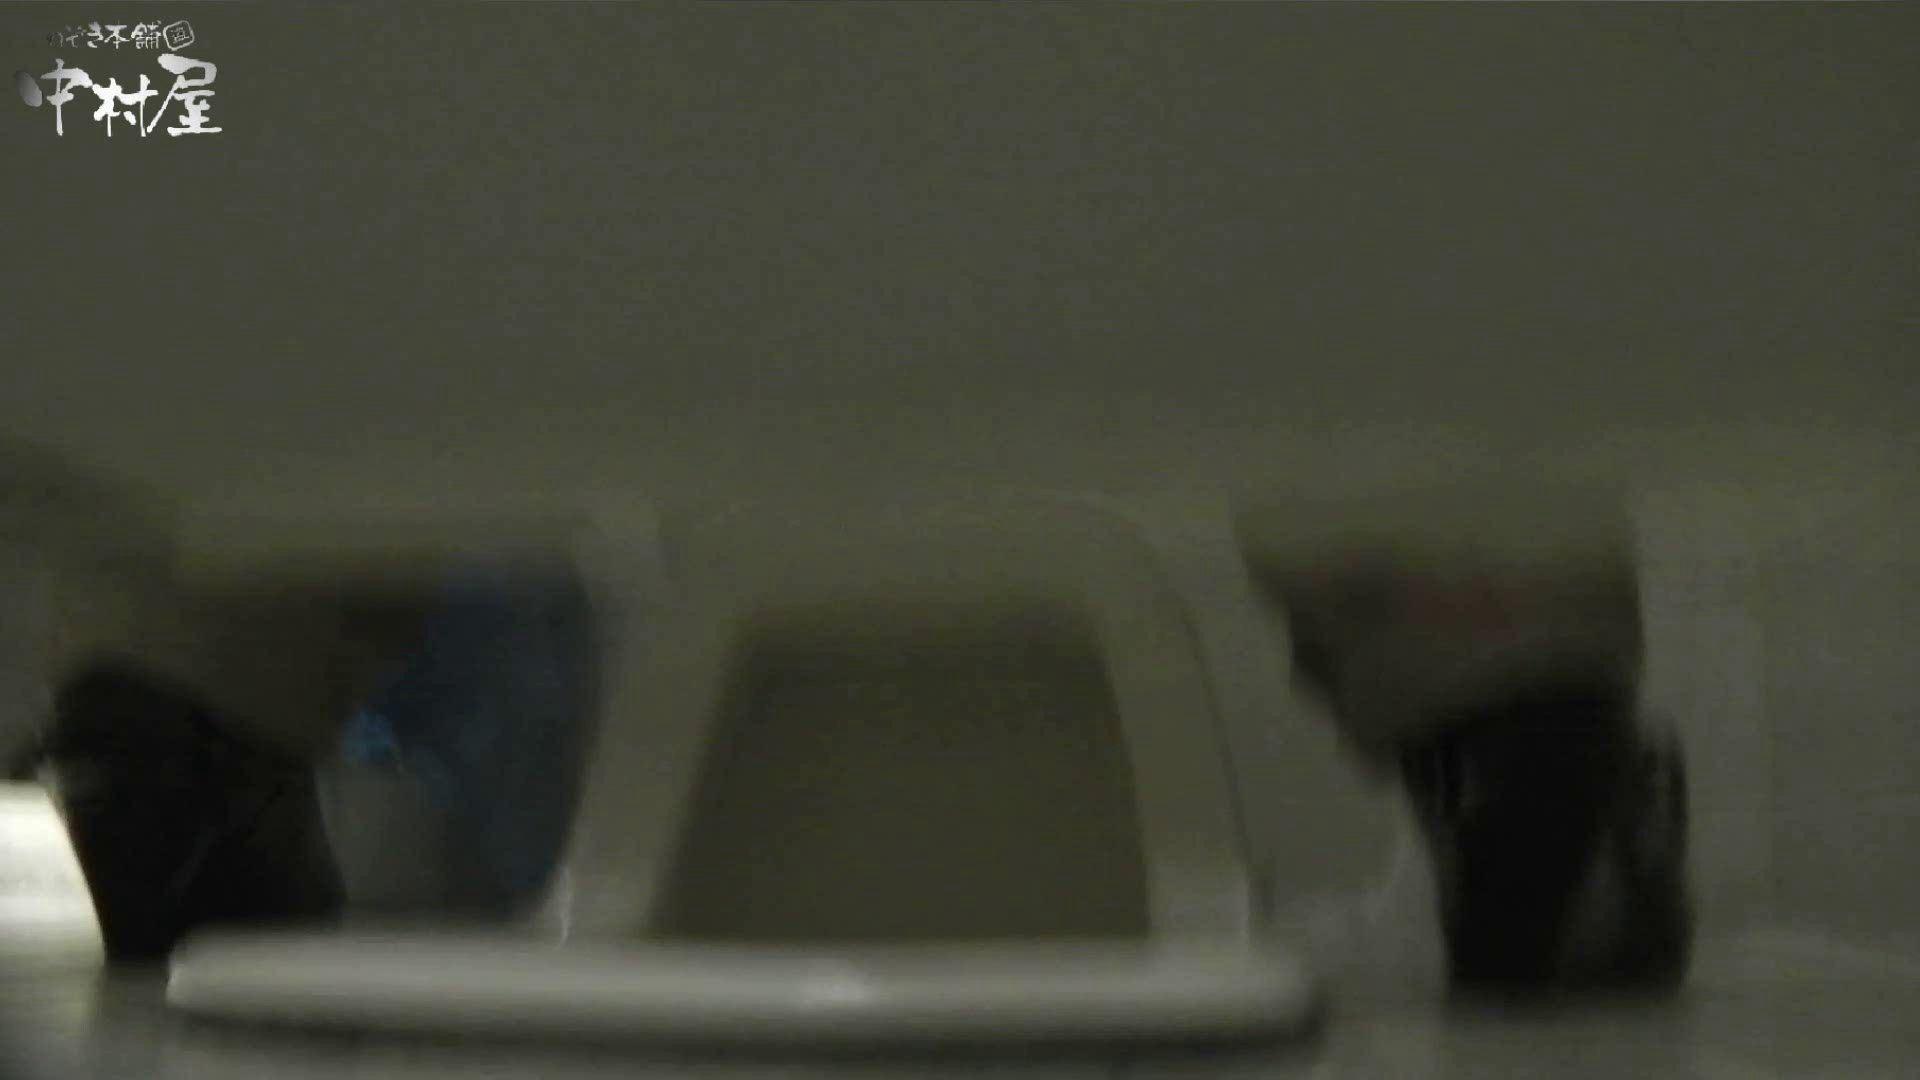 vol.55 命がけ潜伏洗面所! フンばりどころ プライベート AV無料動画キャプチャ 88連発 27